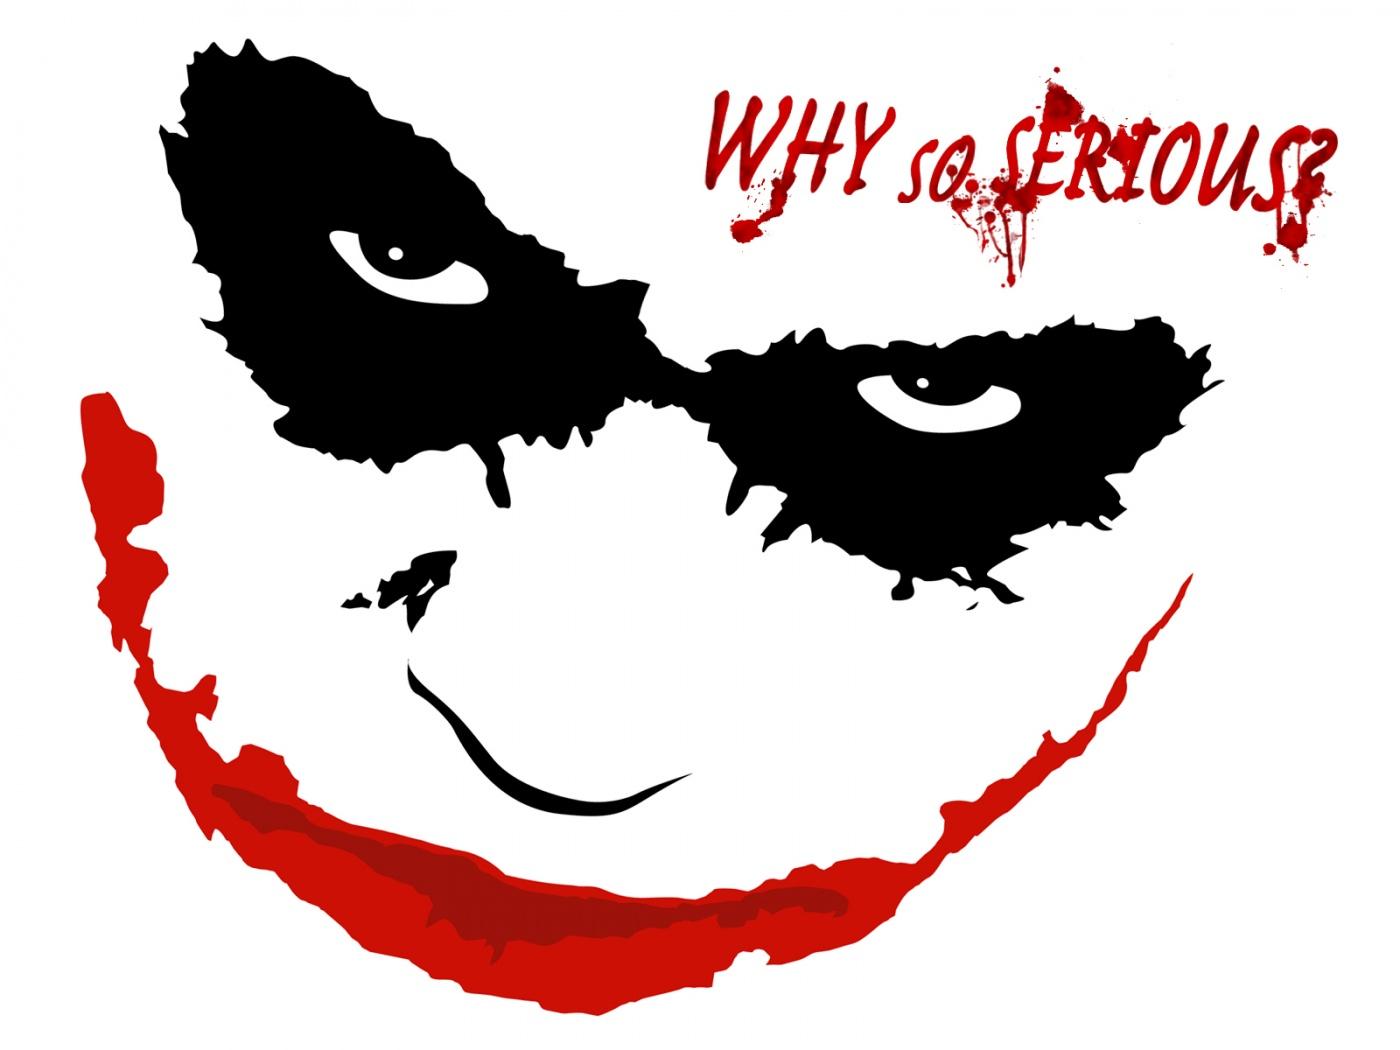 Joker clipart joker face Clipart knight collections Knight dark